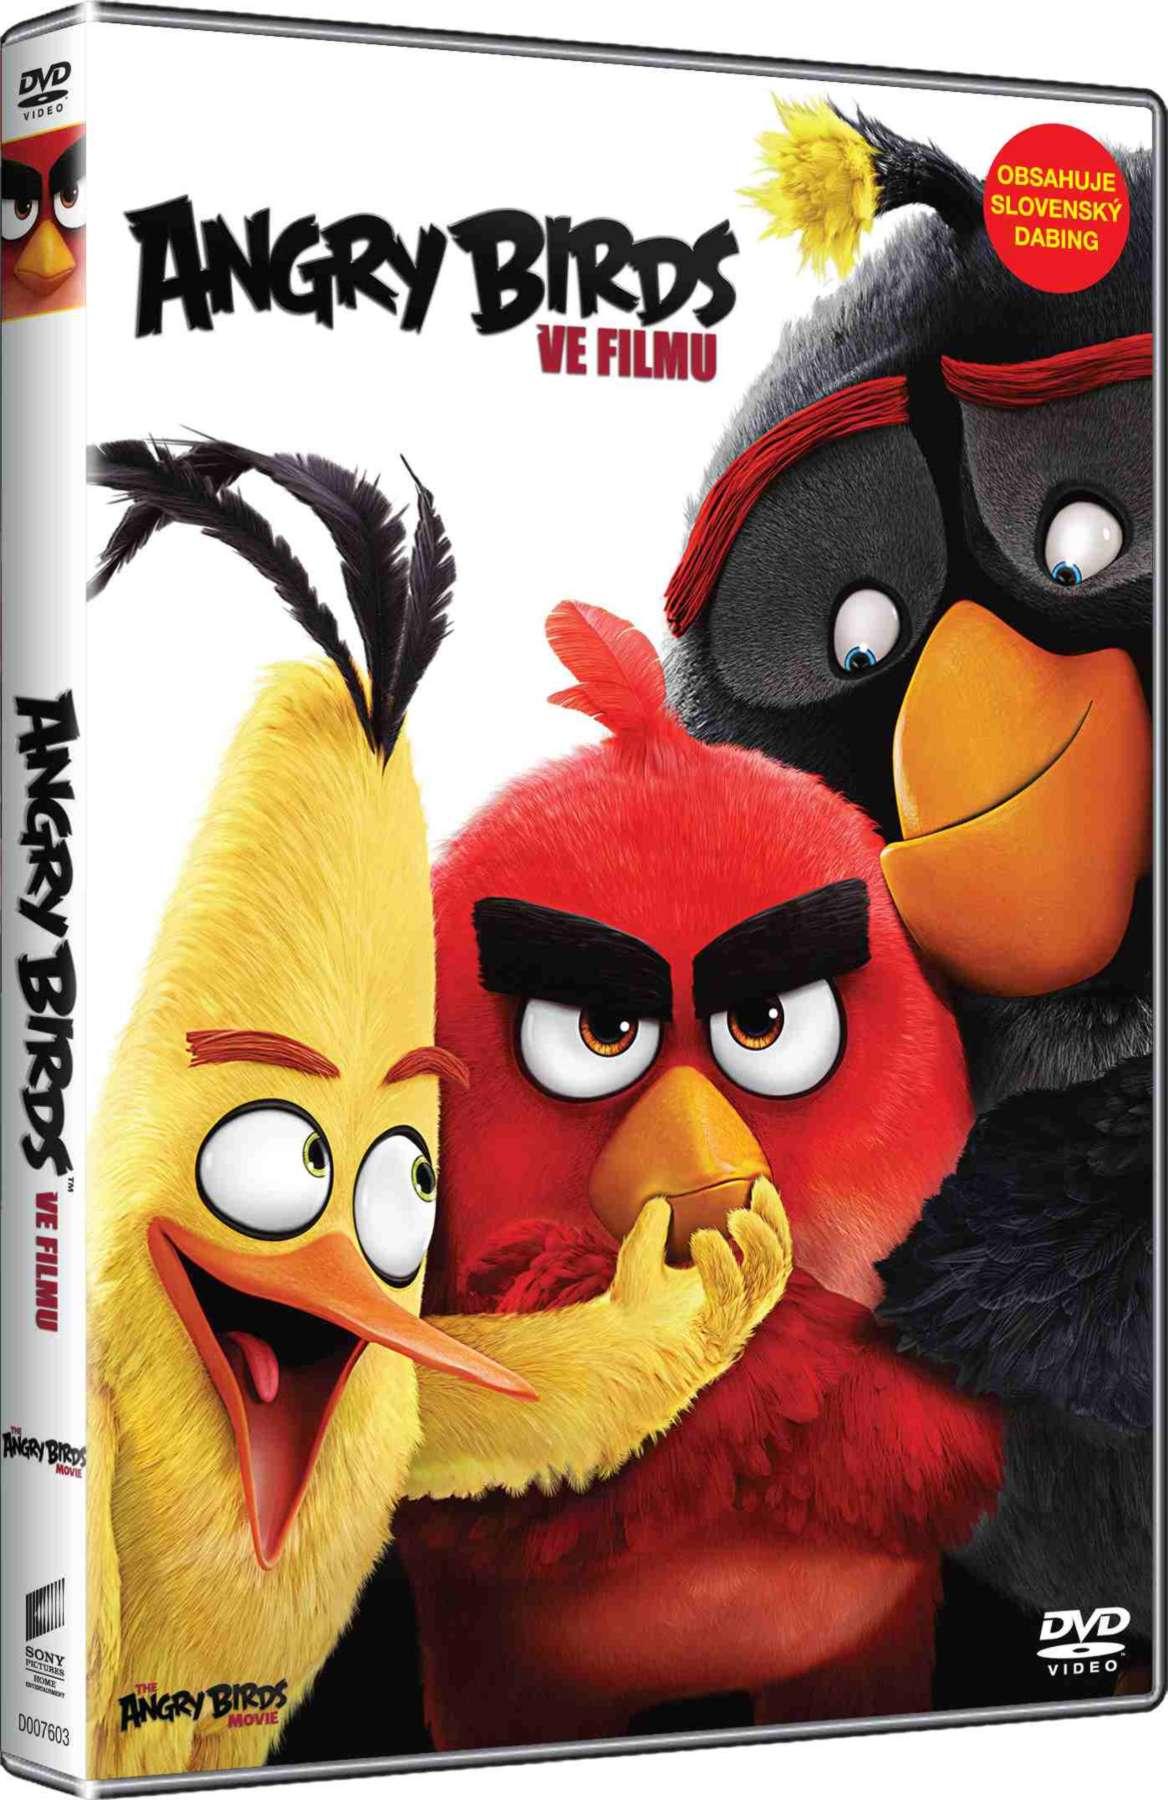 ANGRY BIRDS VE FILMU - DVD